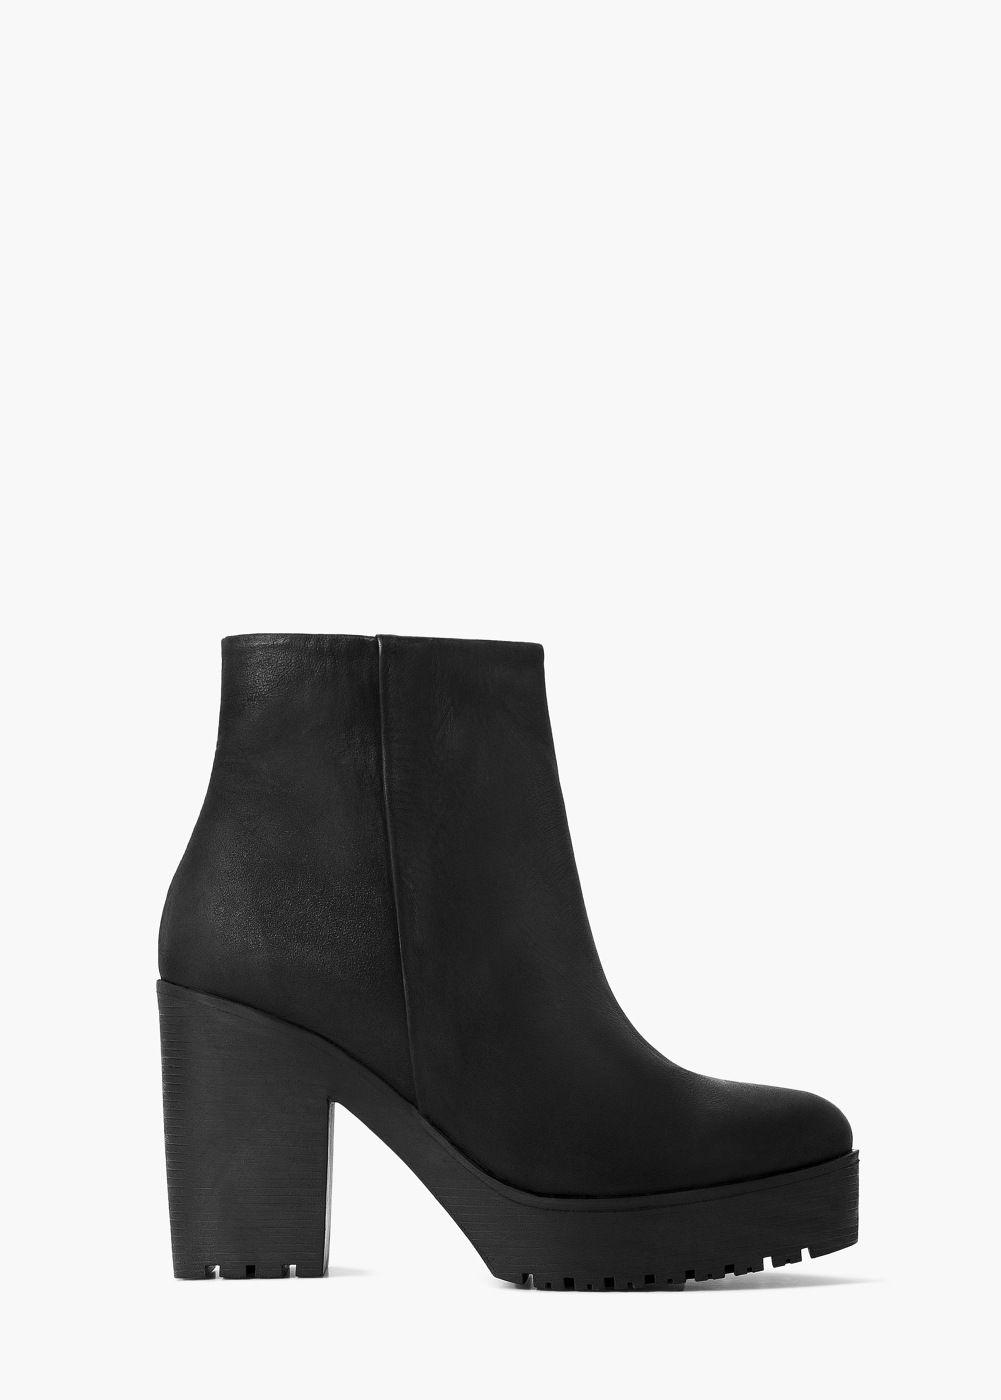 e0343cfbd Кожаные ботинки на платформе - Женская em 2019 | shop online ...